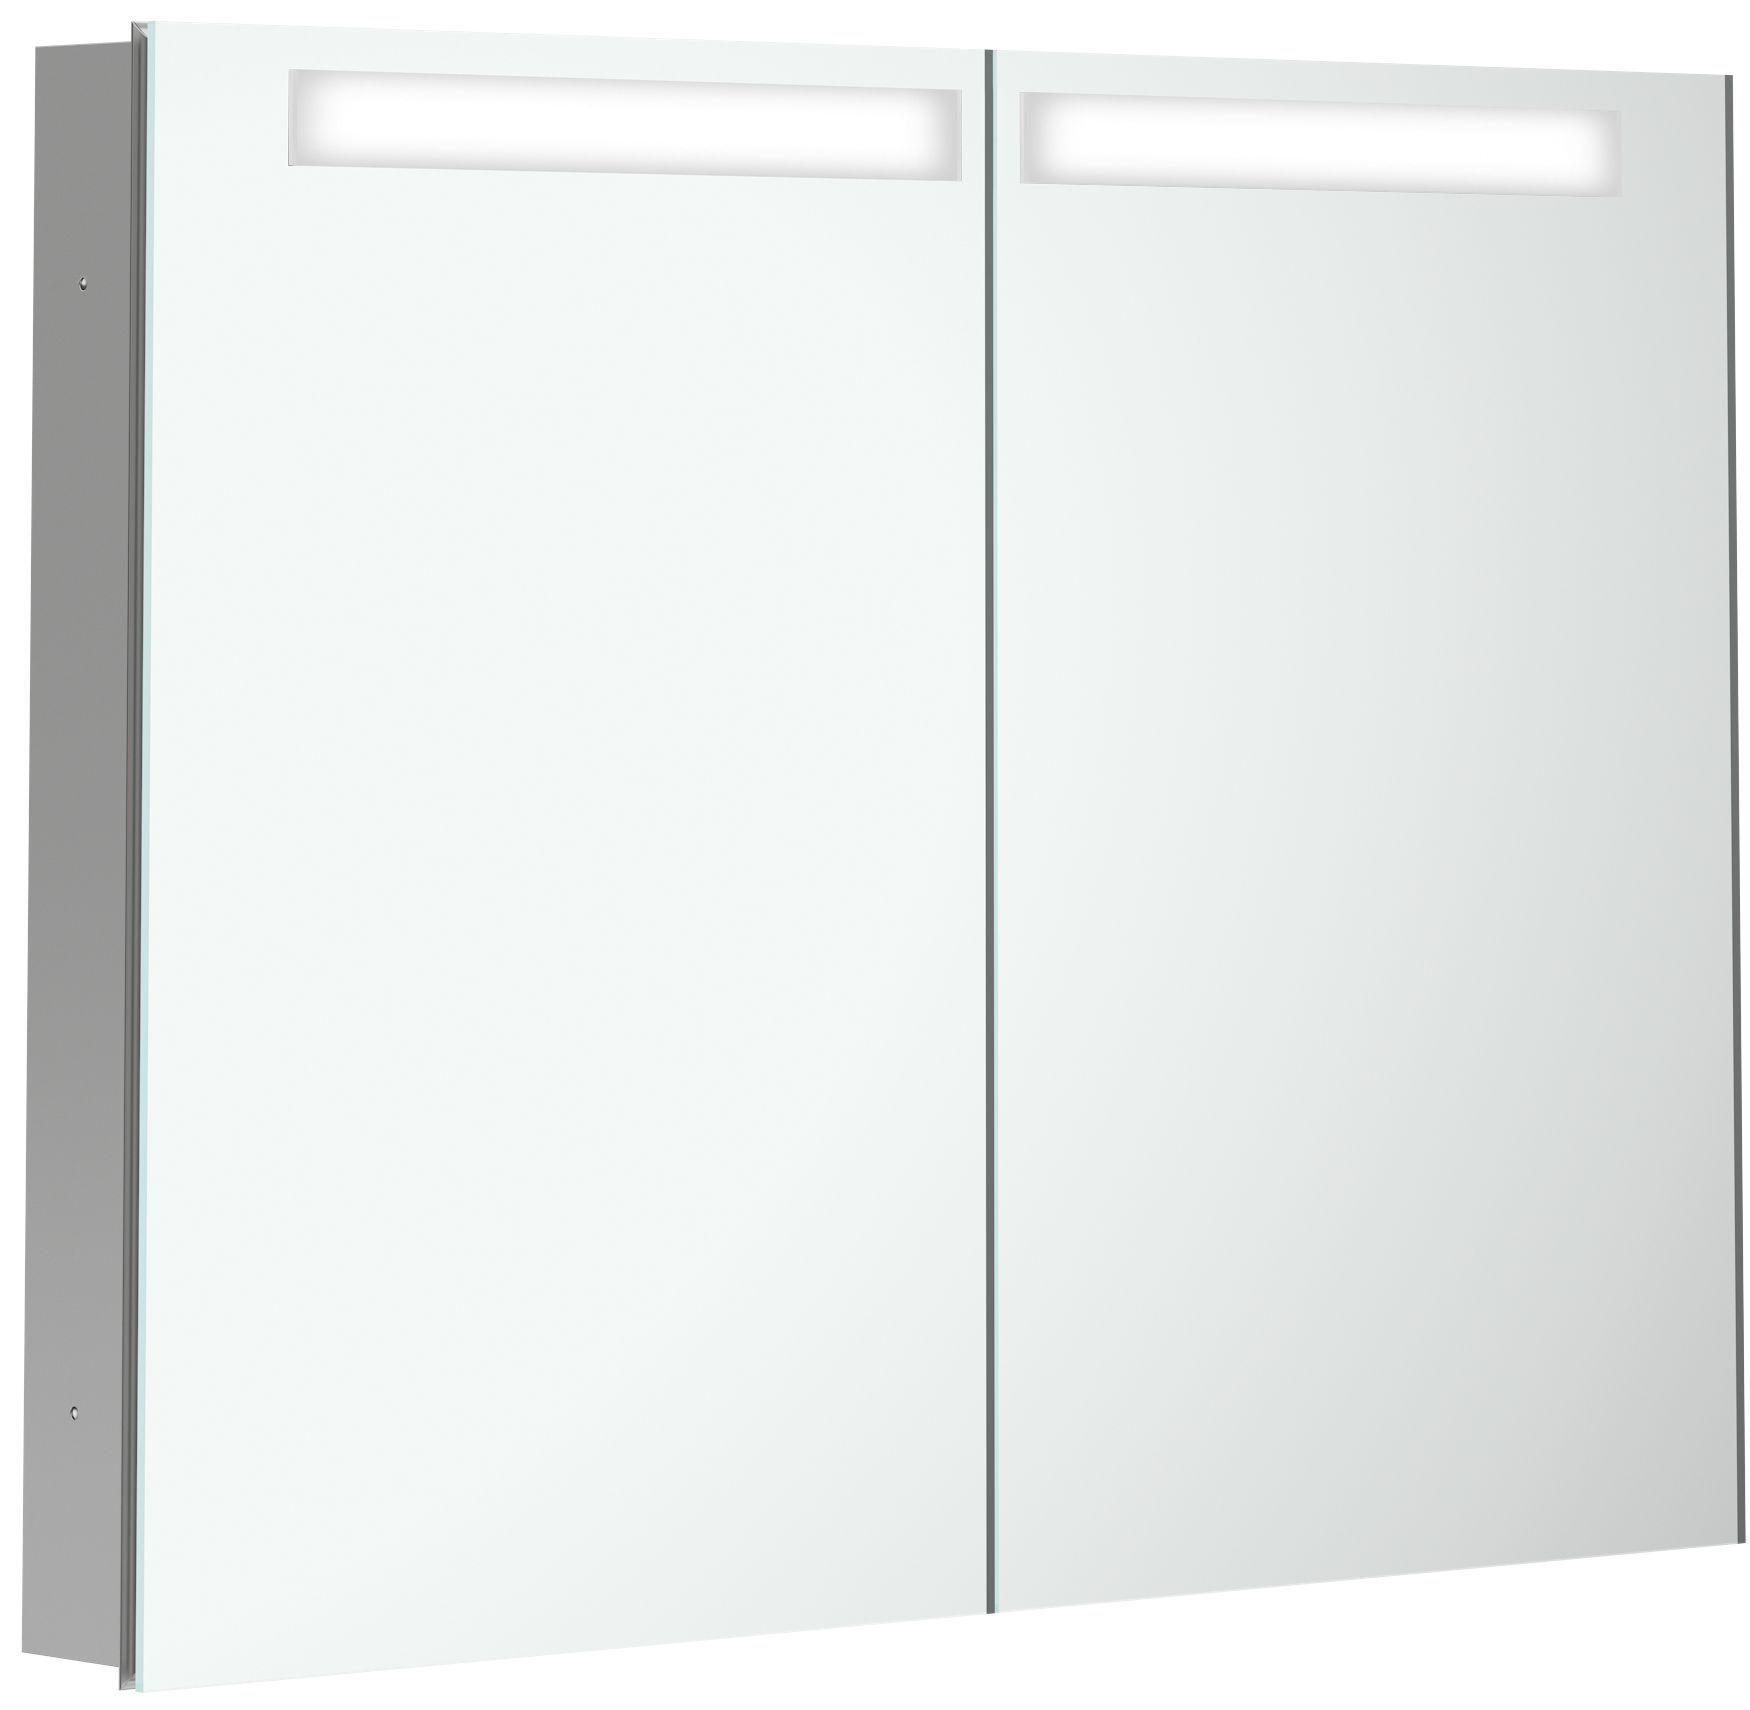 Villeroy & Boch My View In Spiegelschrank mit LED Beleuchtung B:80,1xH:74,7xT:10,7cm A4358000